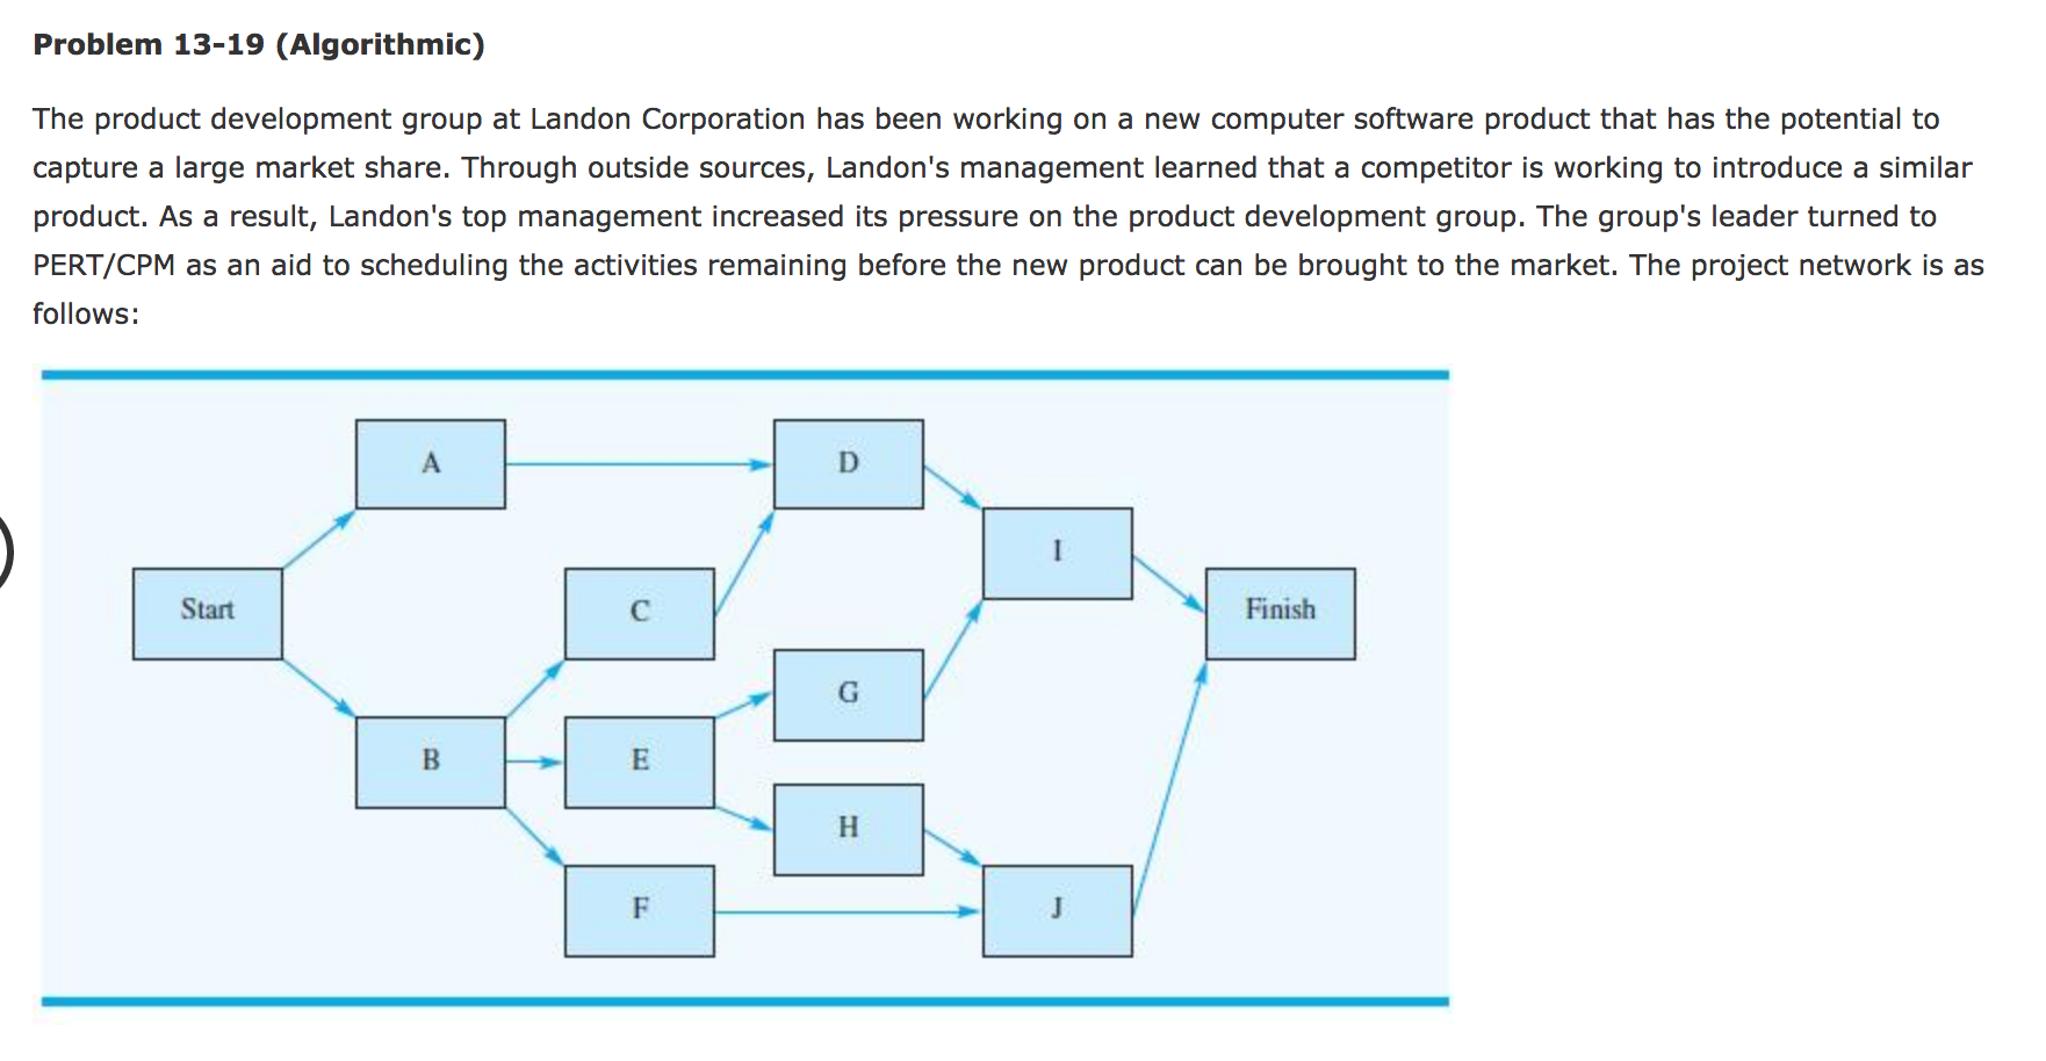 Operations management archive november 21 2016 chegg problem 13 19 algorithmic the product developmen fandeluxe Images